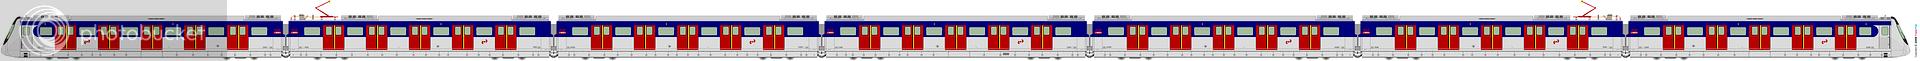 Train 1952